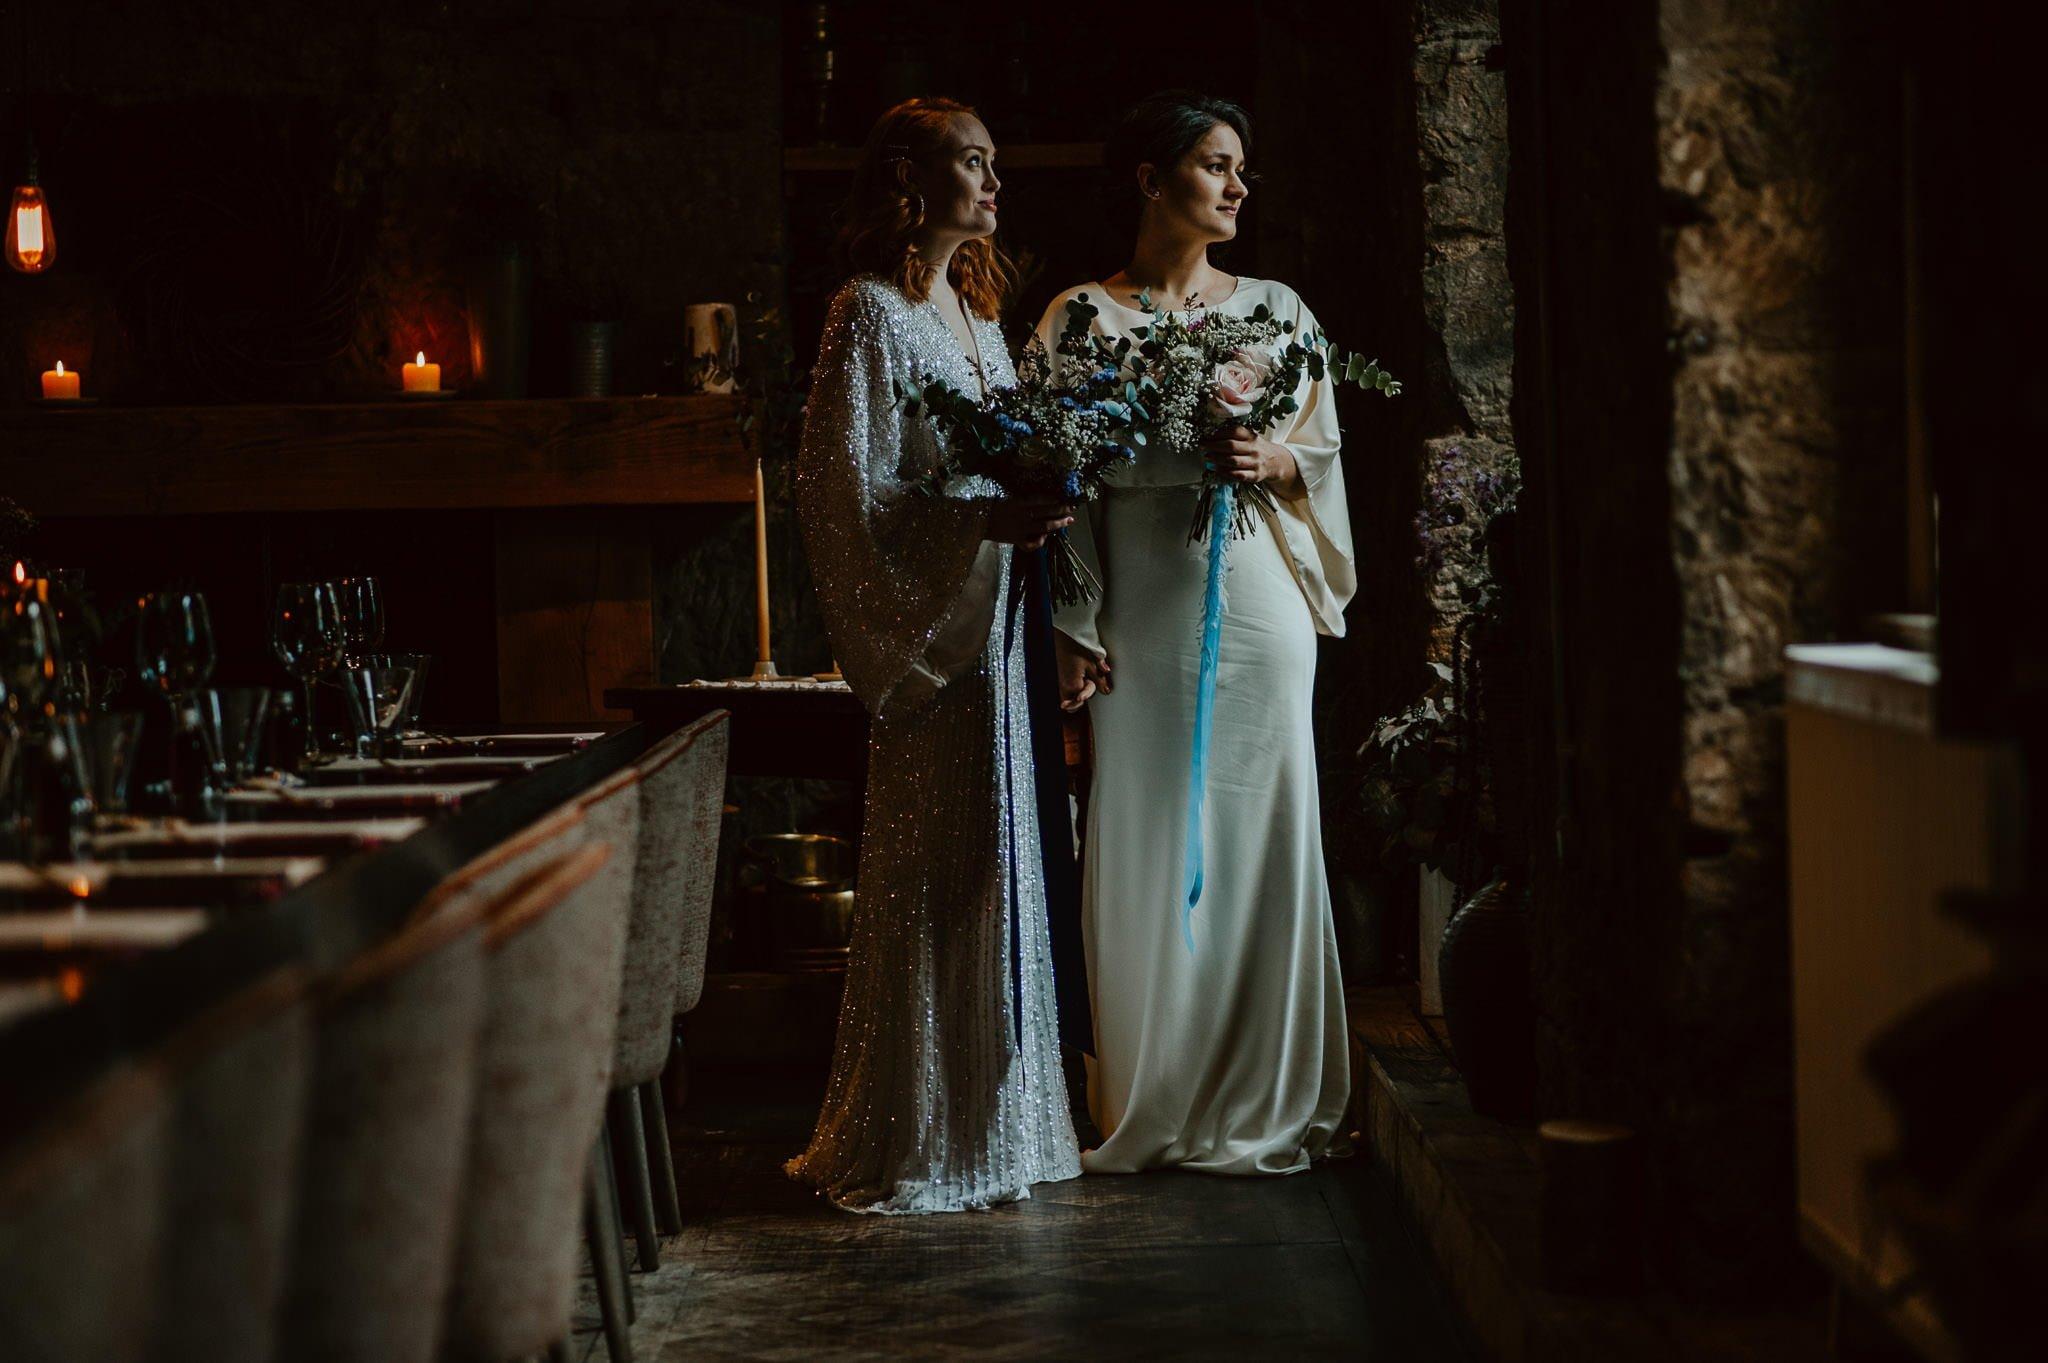 A Dreamy Pre-Raphaelite Wedding at the Bothy in Glasgow 11